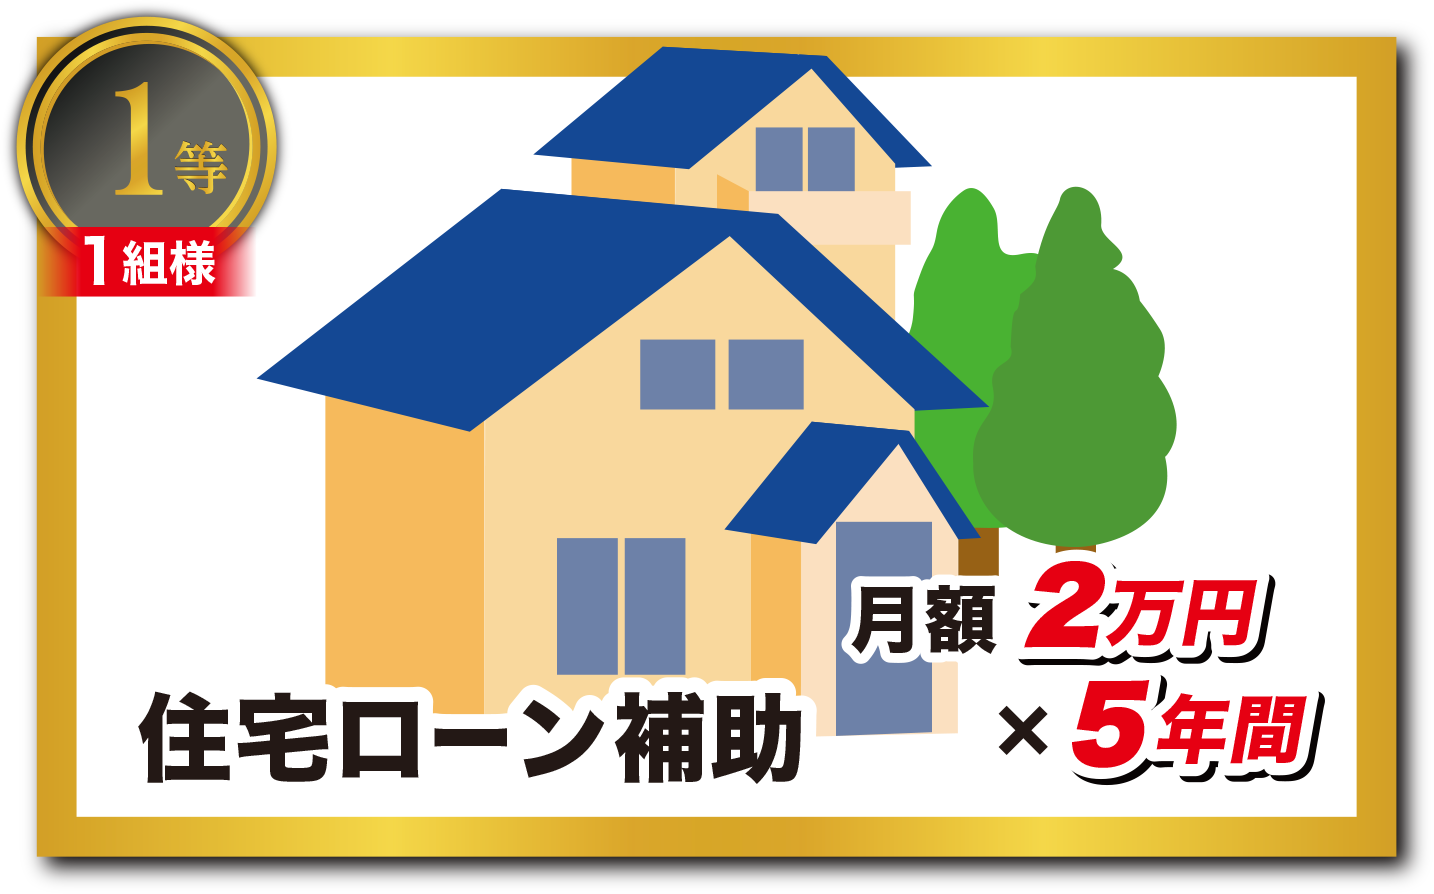 1等:住宅ローン補助|月額2万円×5年間(1組様)